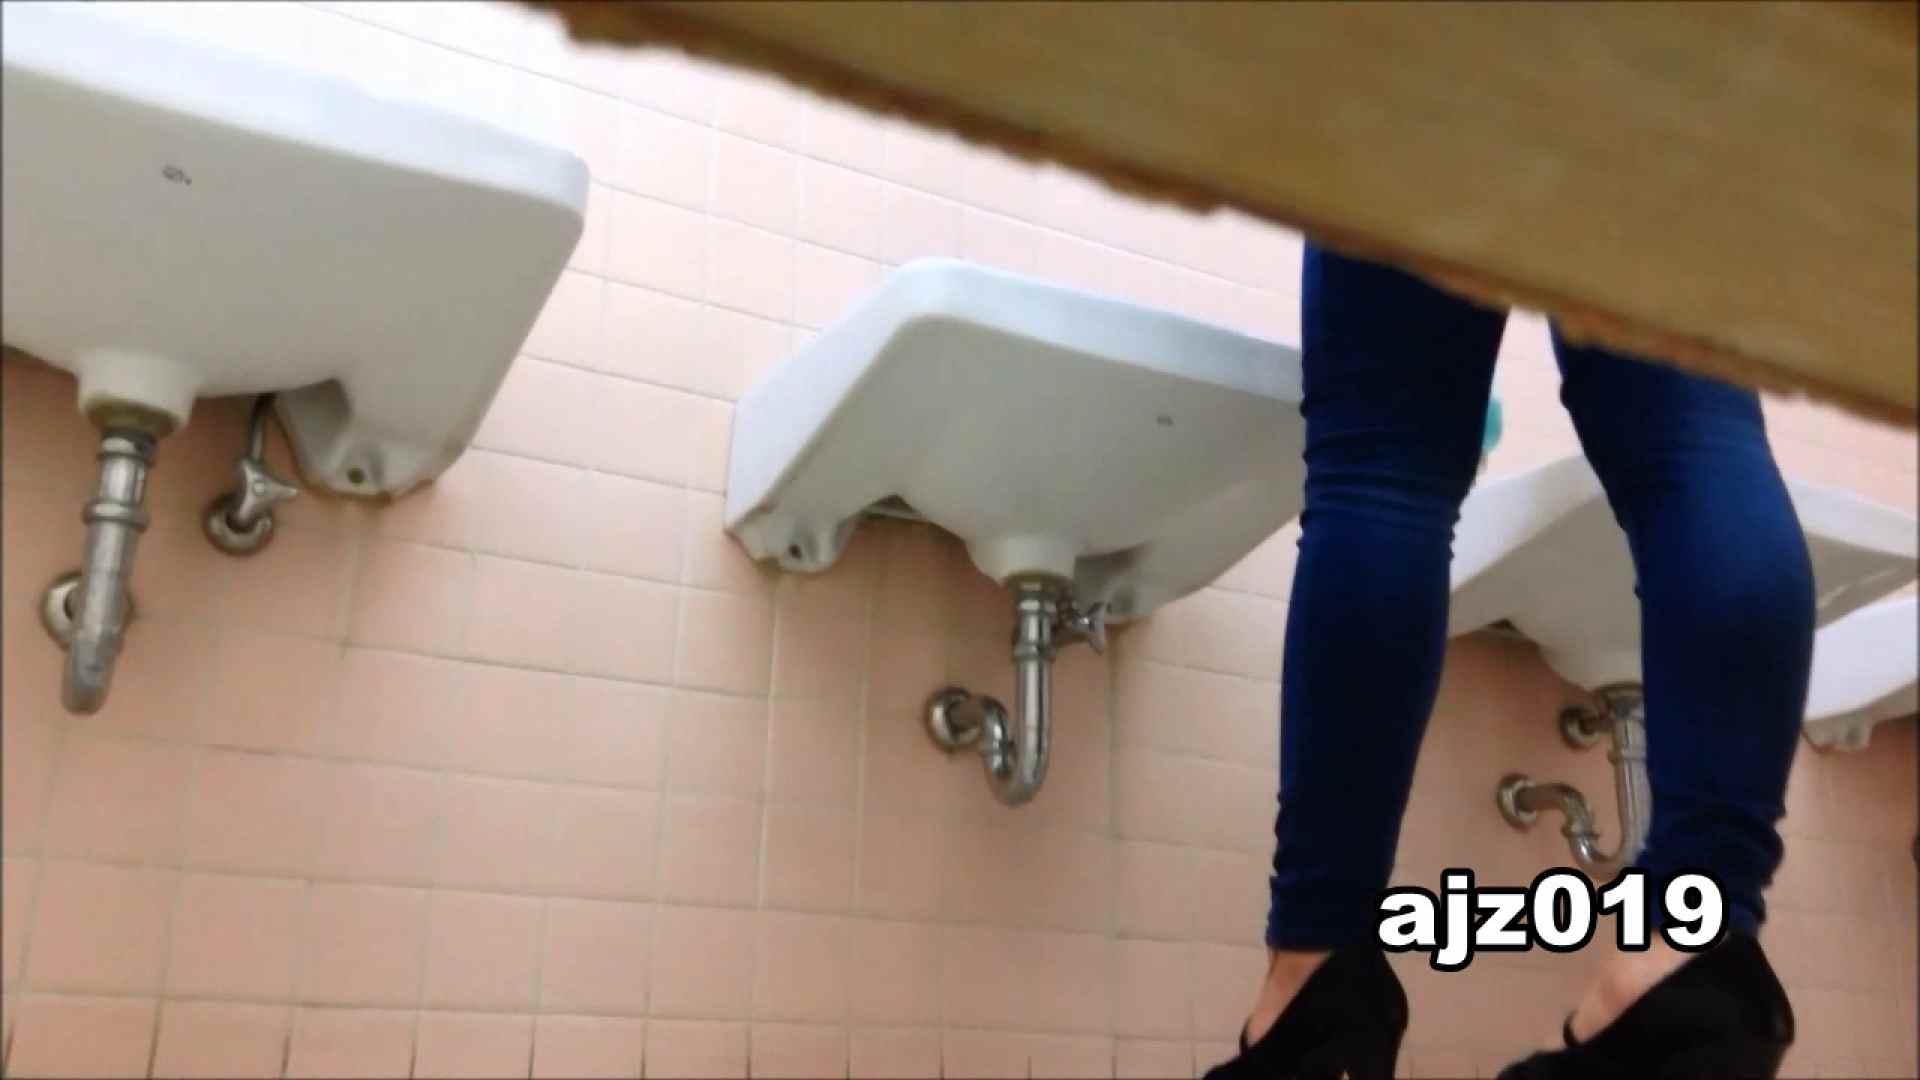 某有名大学女性洗面所 vol.19 排泄 | 和式でハメ撮り  84pic 43